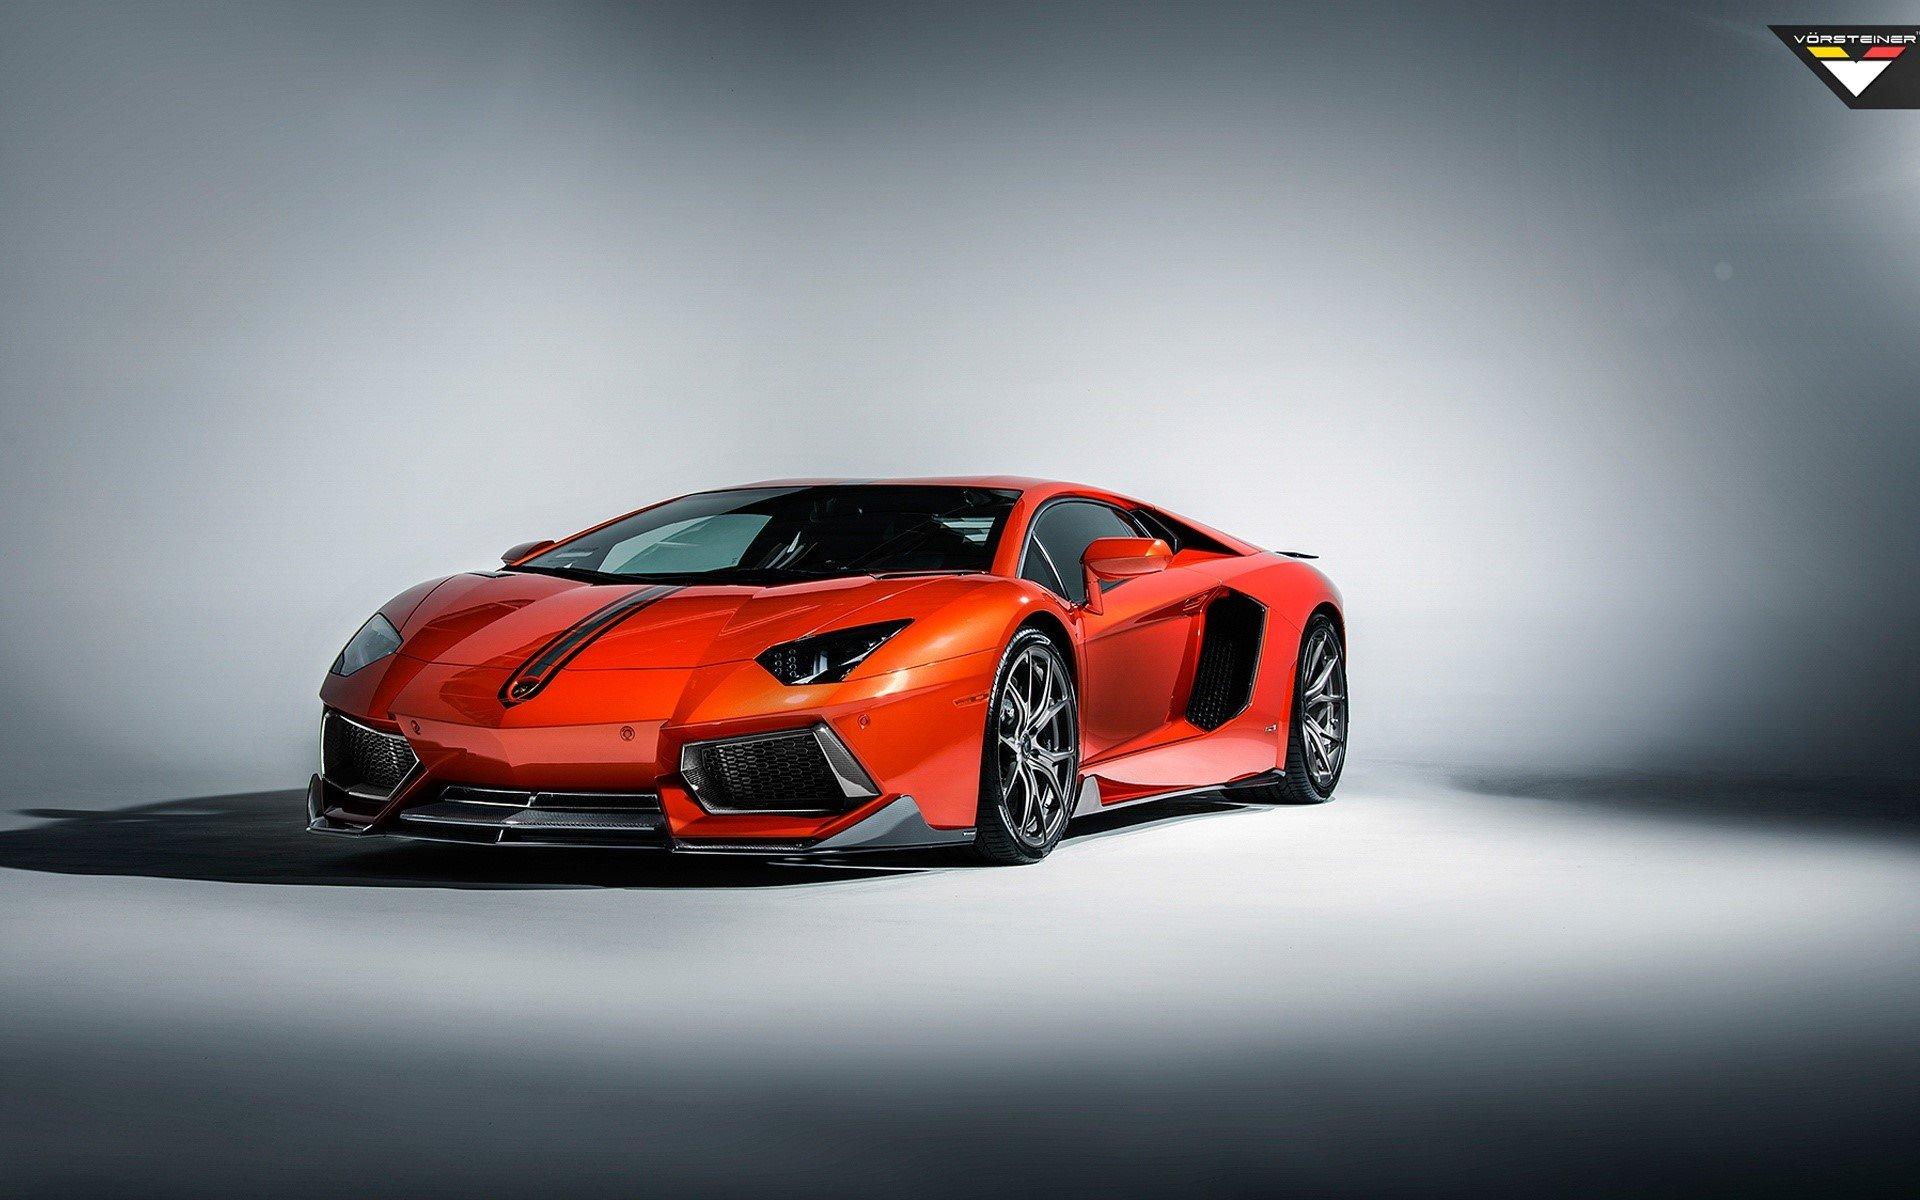 Fondos de pantalla Vorsteiner Lamborghini Aventador-V LP-740